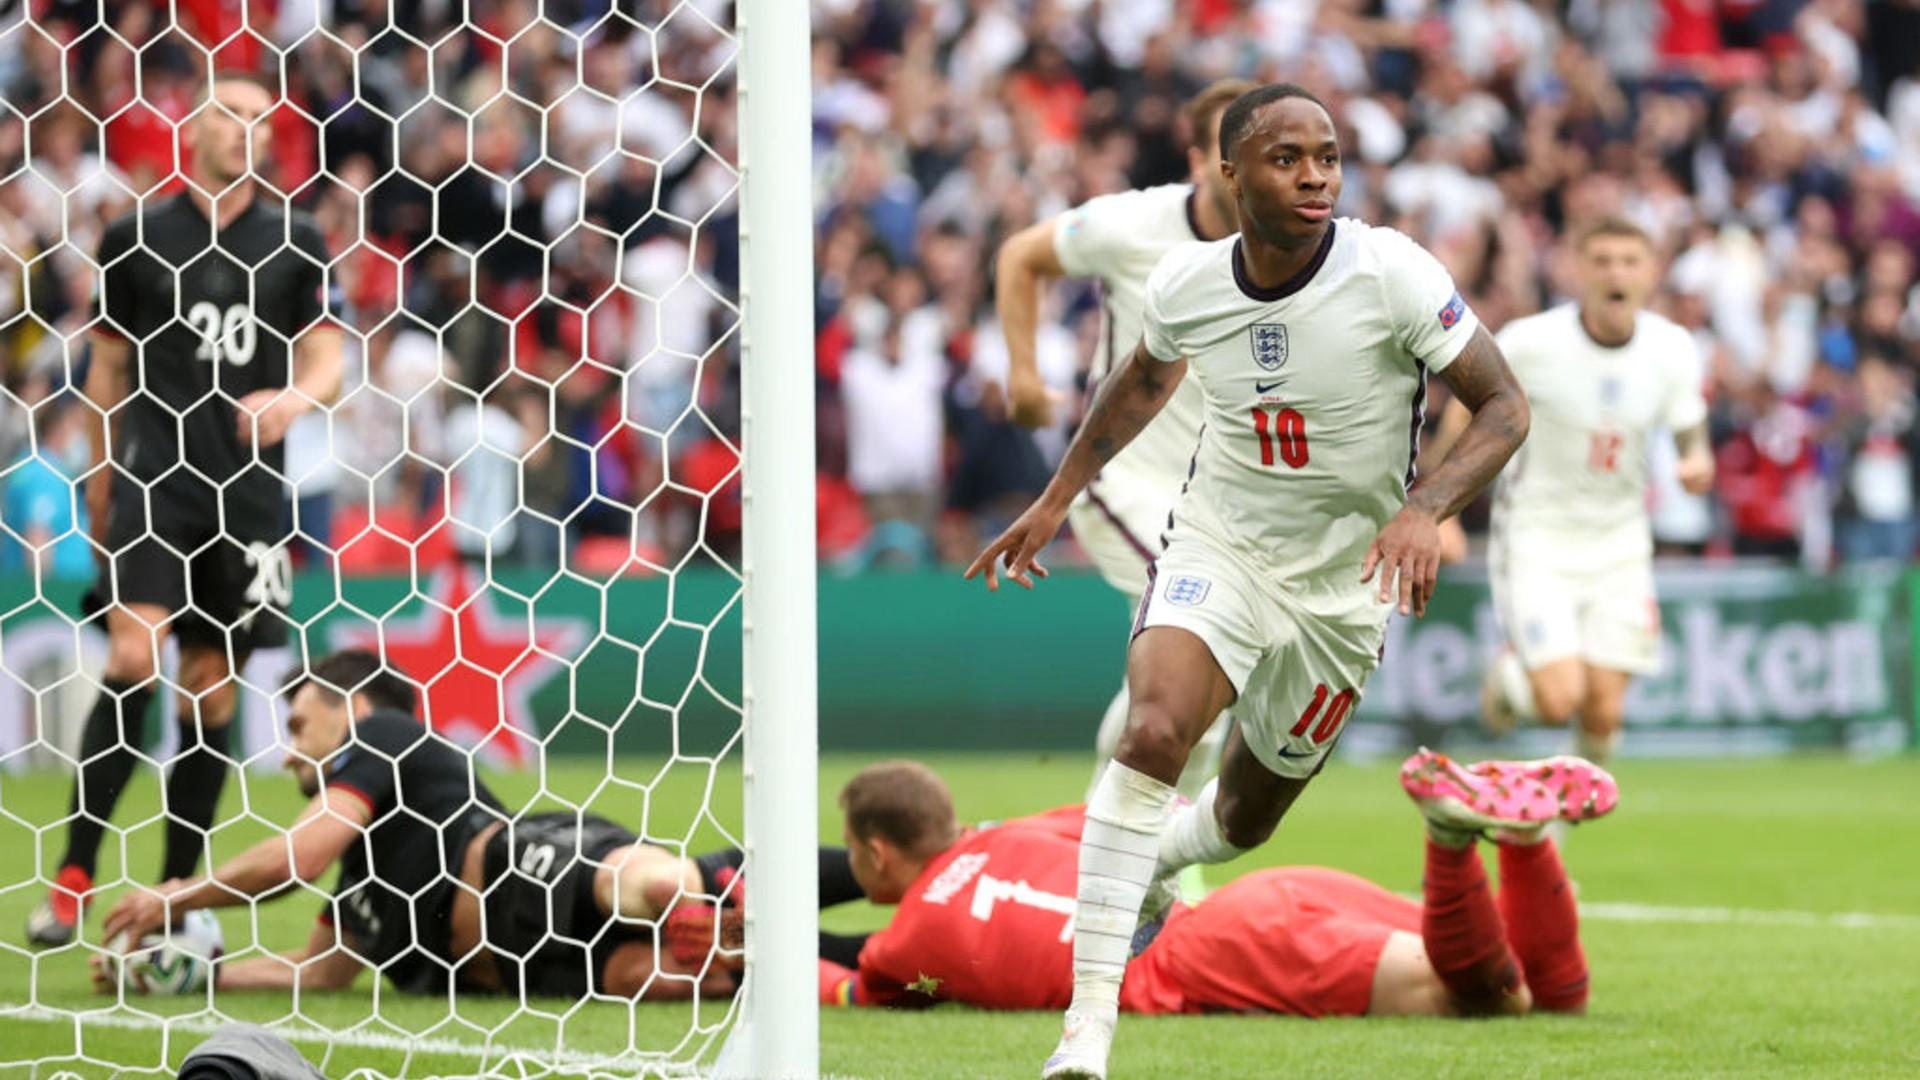 LETHAL WEAPON: Raheem Sterling celebrates after his last-16 strike against Germany